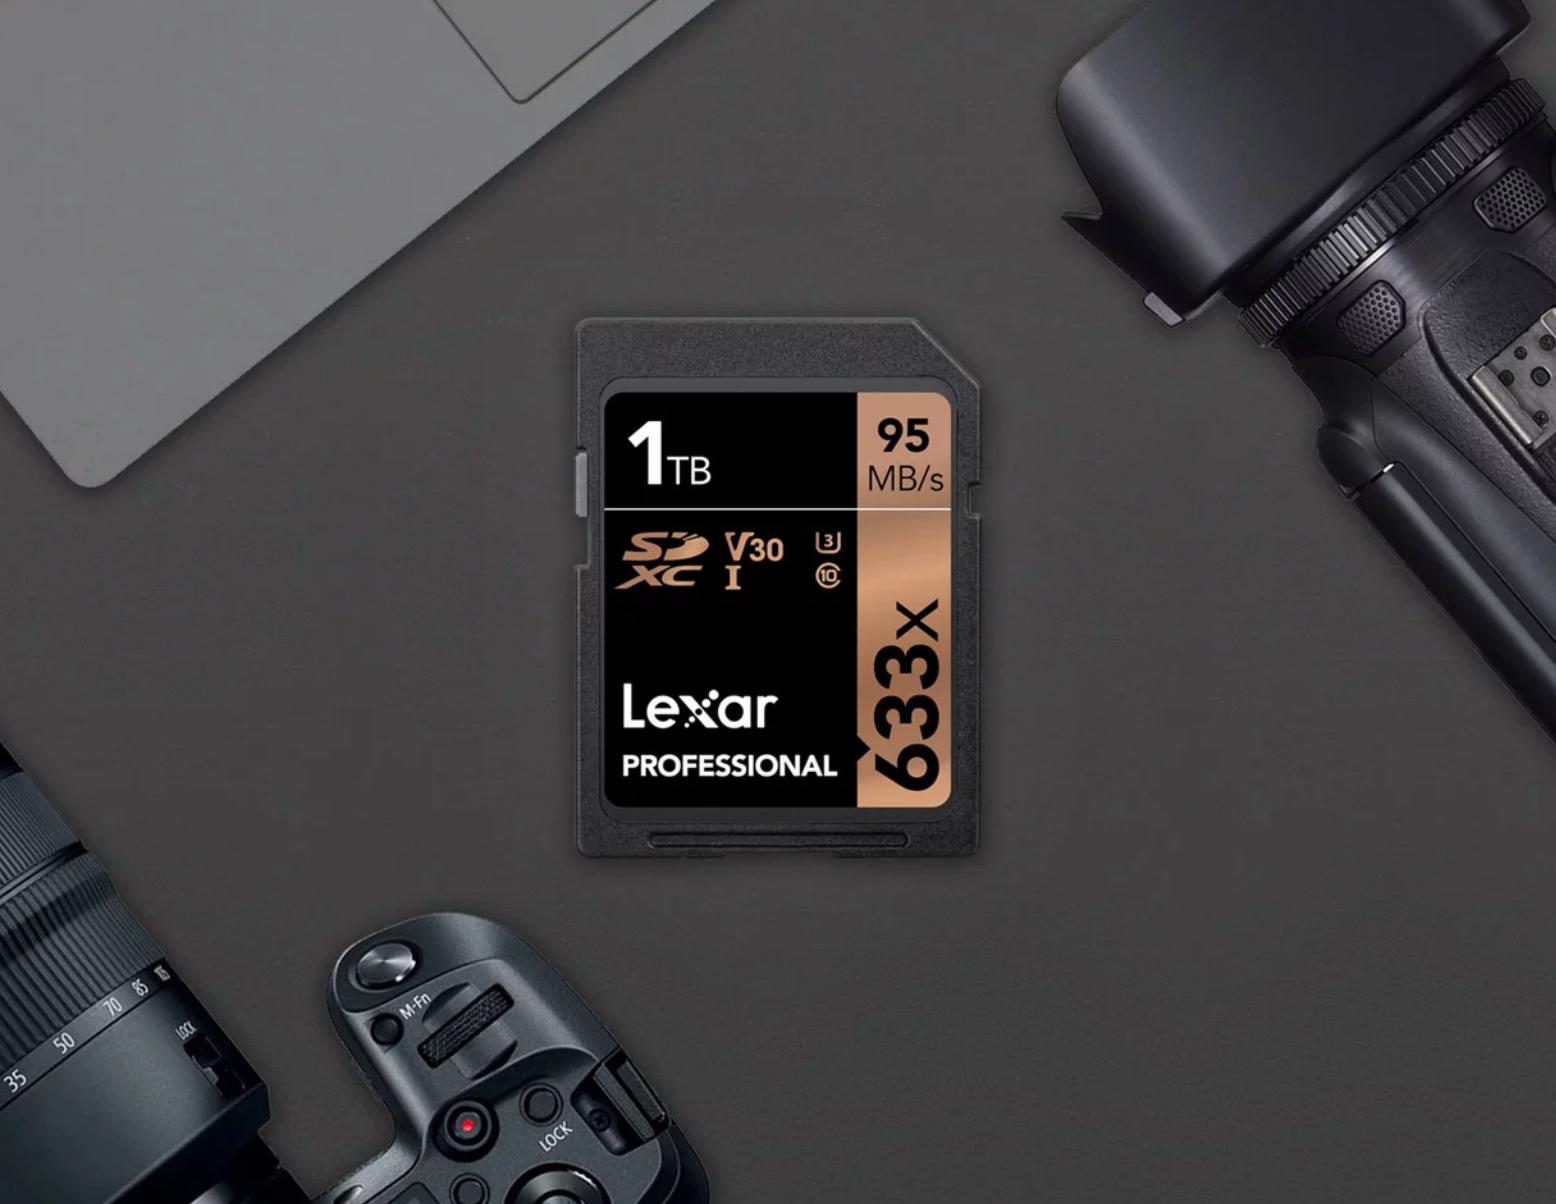 1tb memory card image